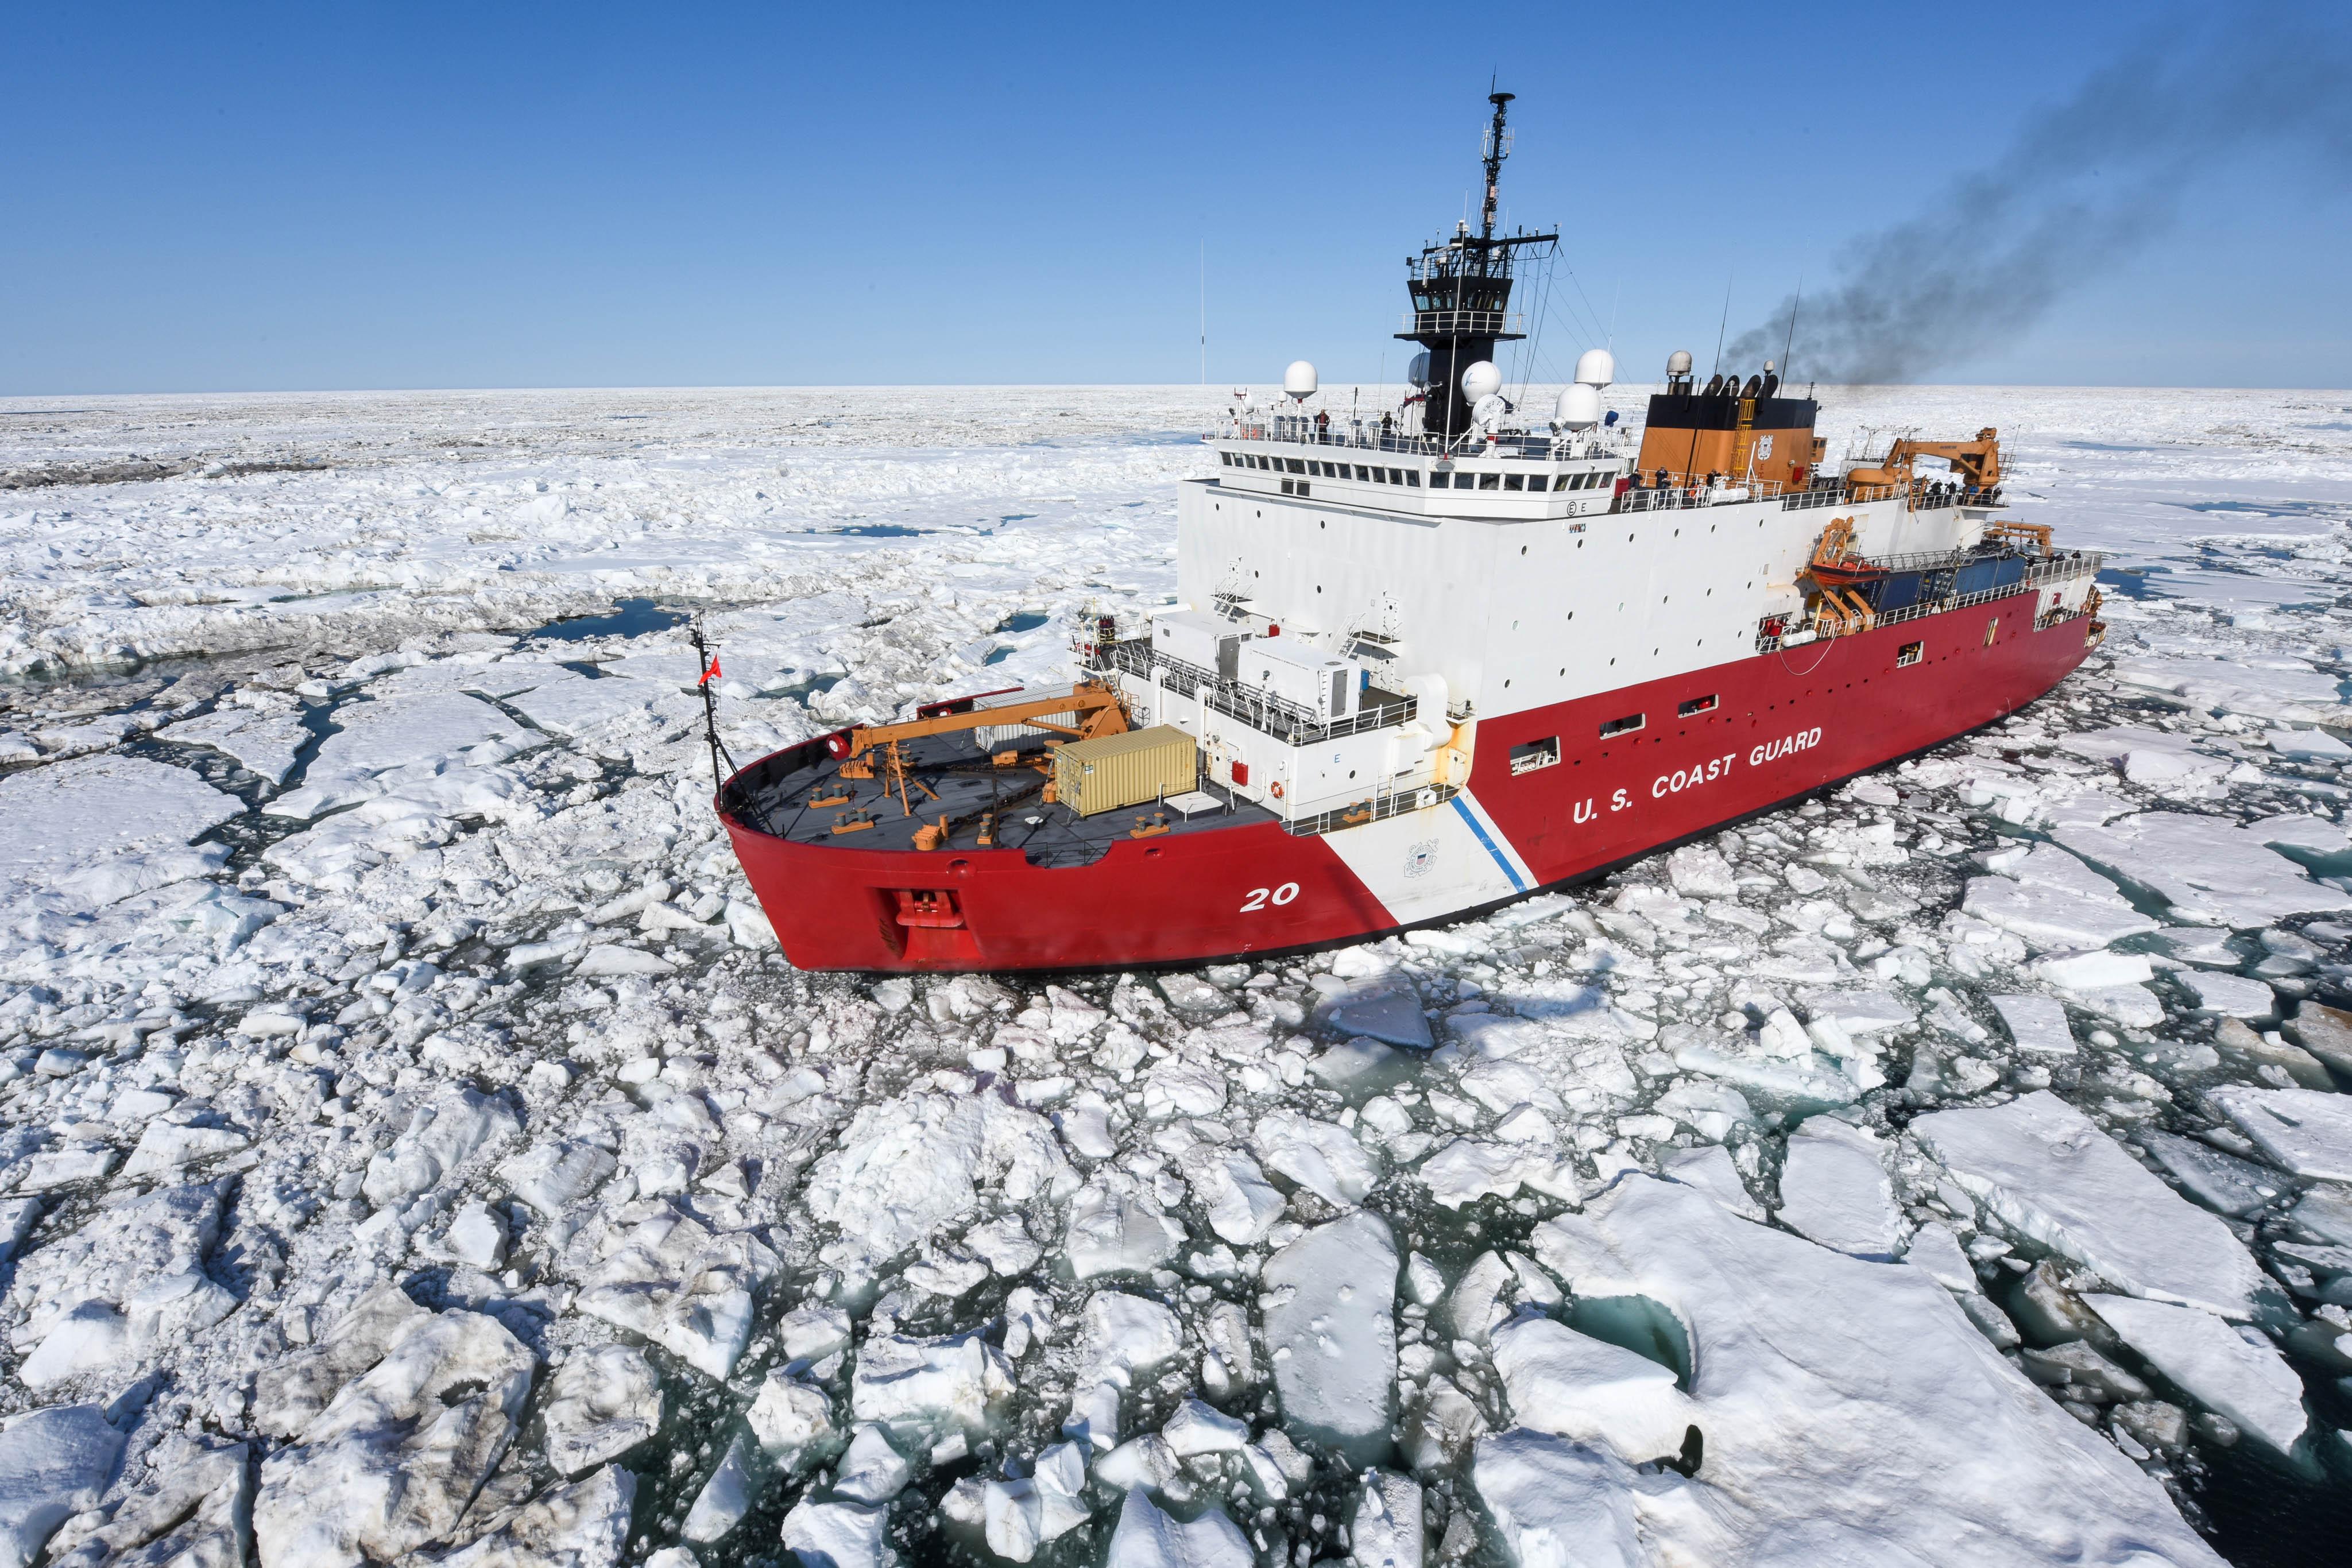 New U.S. spending bill brings icebreaker funding back